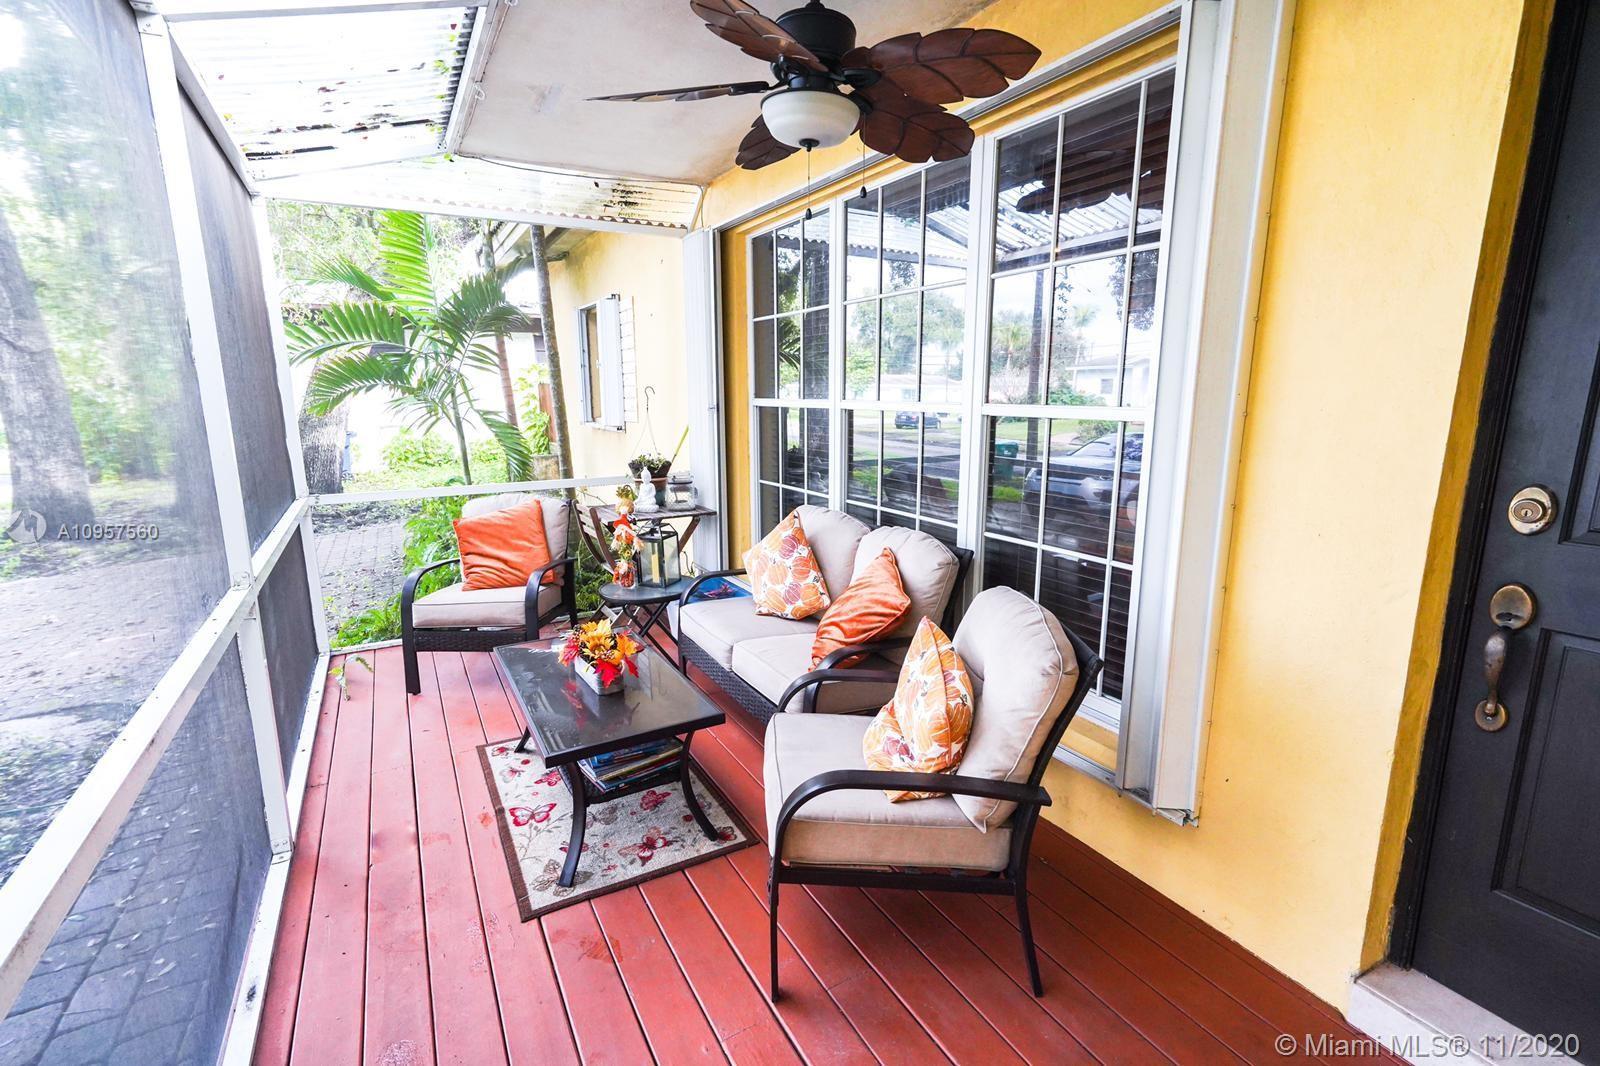 Windward - 17425 NE 12th Ct, Miami, FL 33162